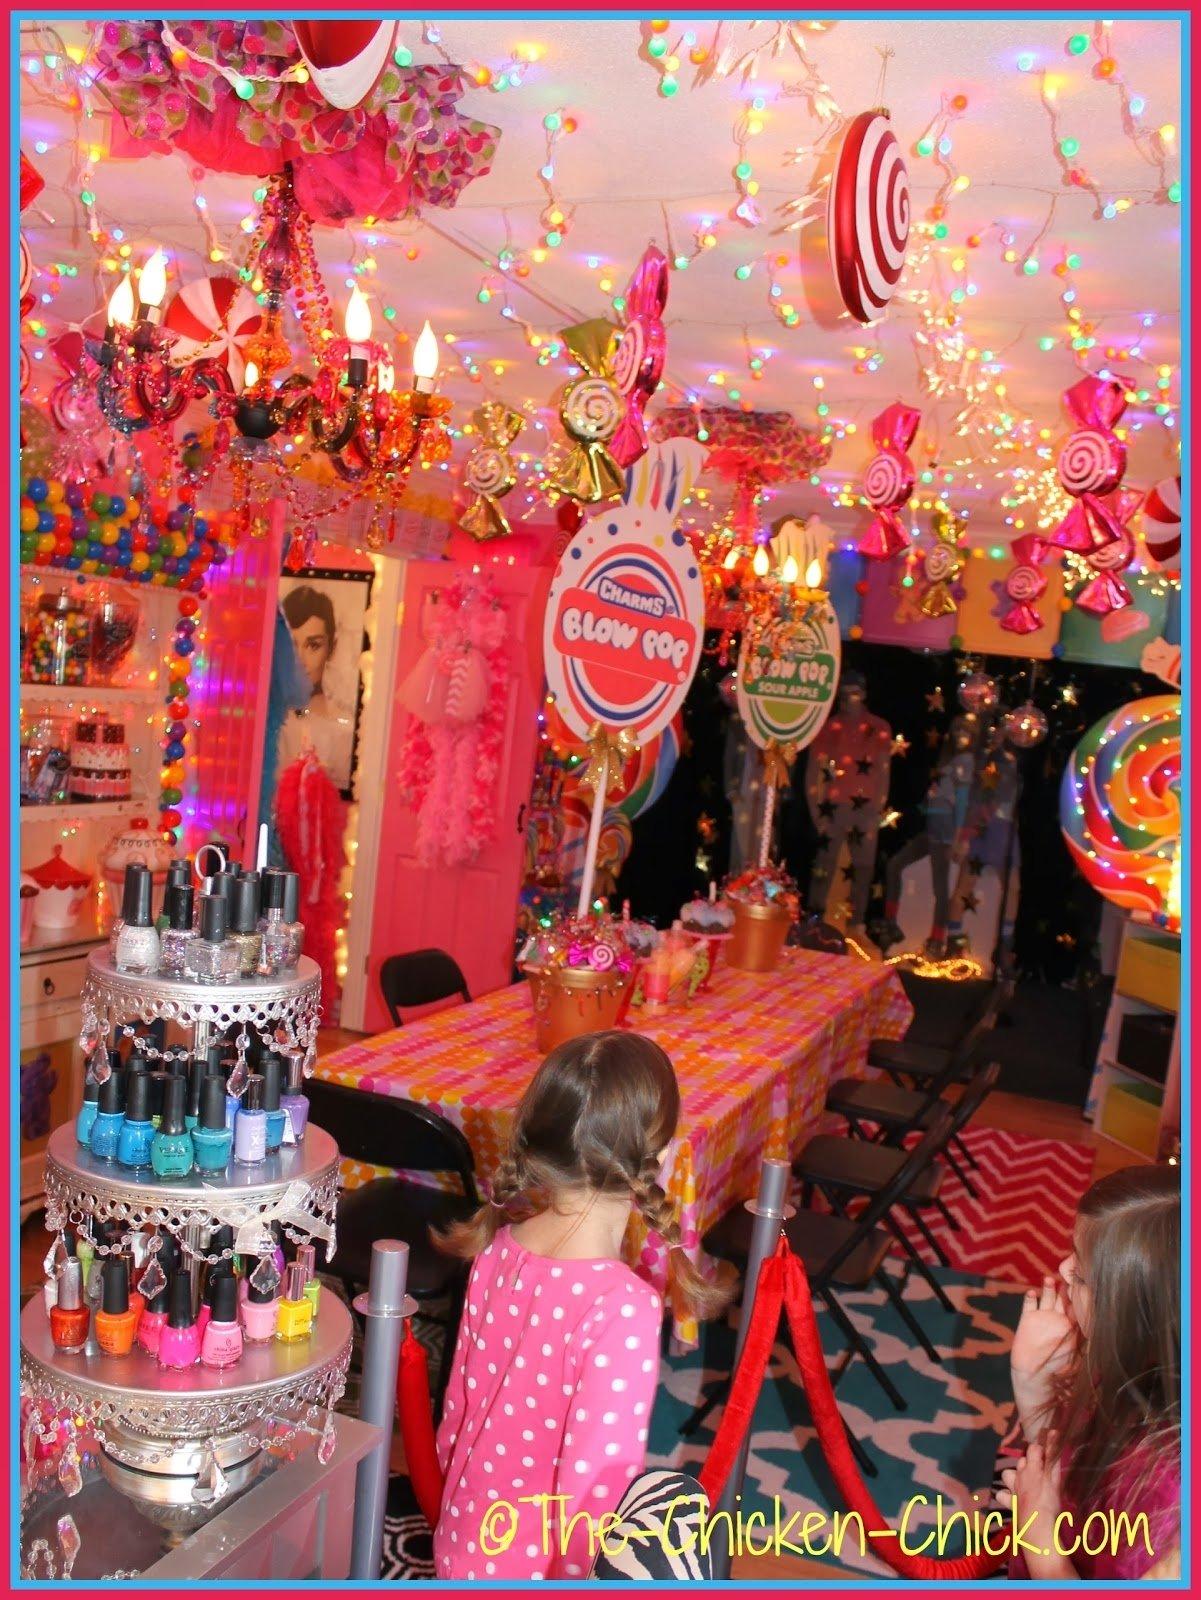 10 Stunning 10 Year Girl Birthday Party Ideas spa birthday party ideas for 7 year olds pool design ideas 1 2021